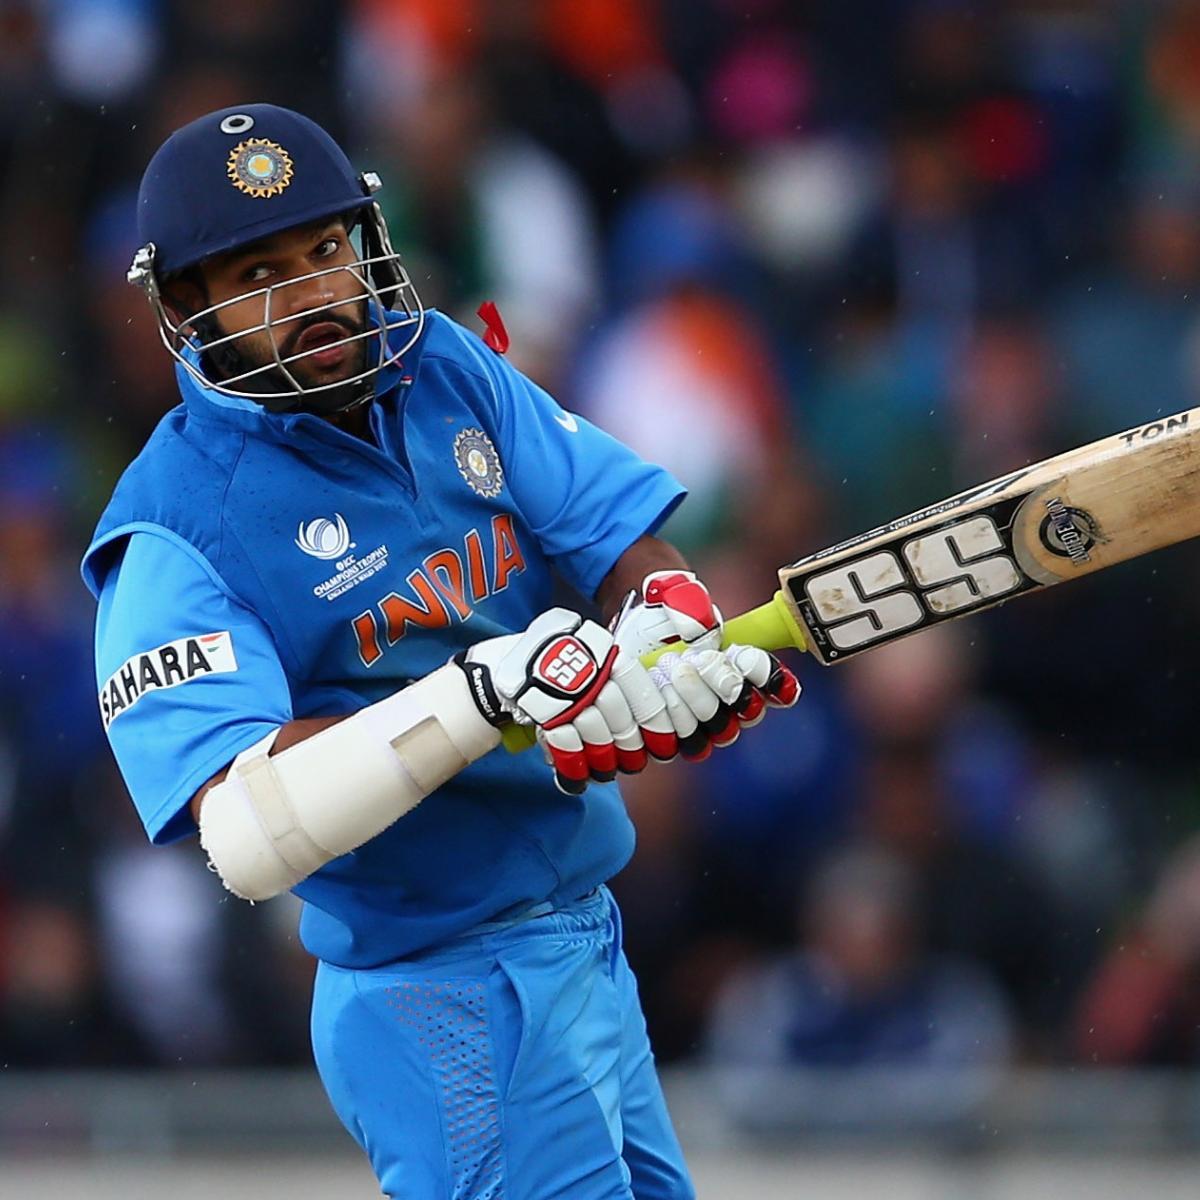 India Vs. Australia, 1st ODI: Date, Time, Live Stream, TV